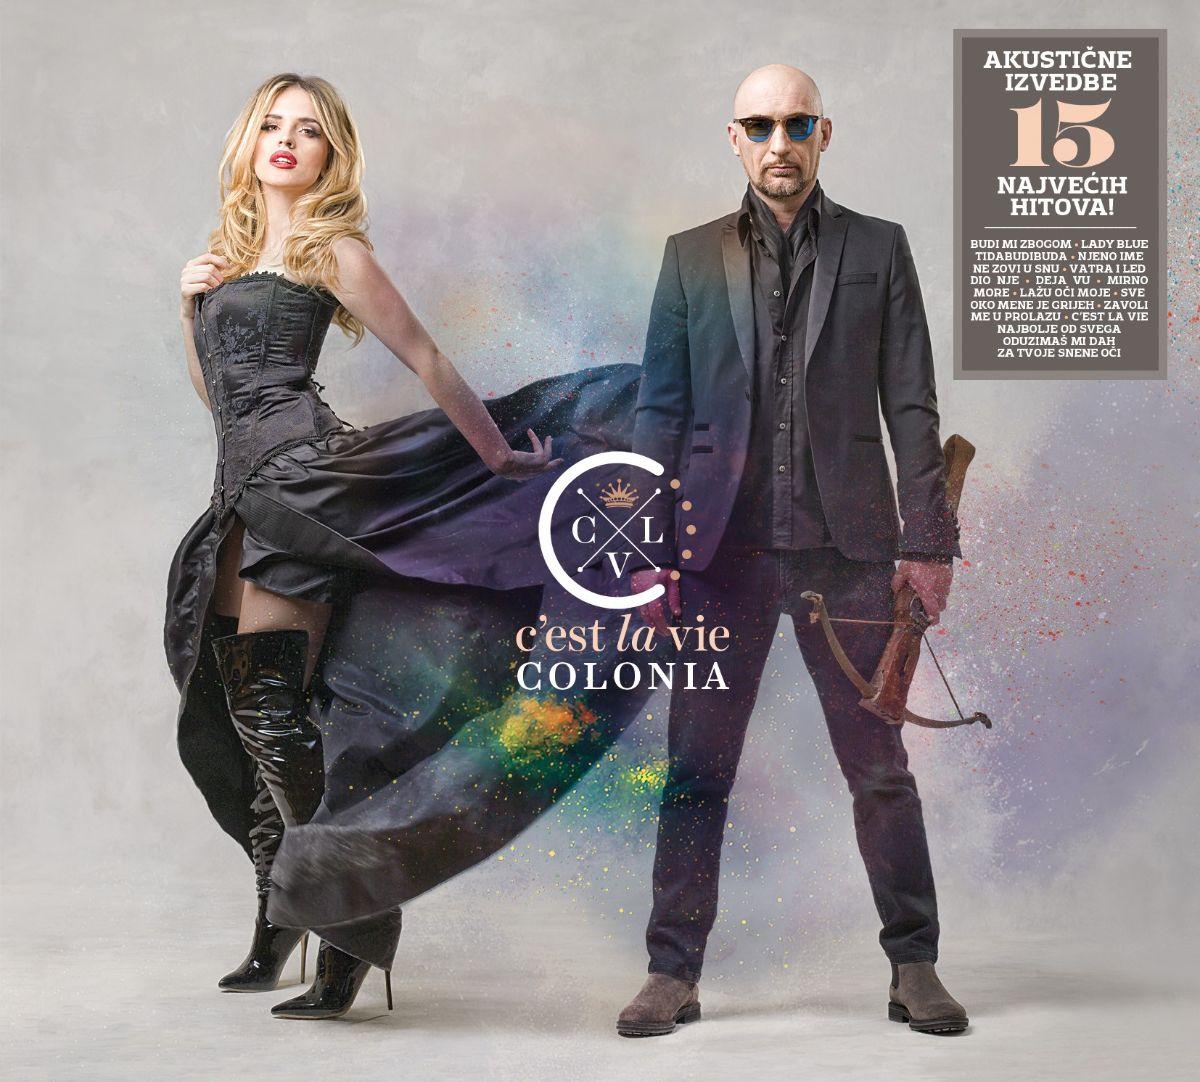 """C'est la vie"", album Colonije koji su fanovi napokon dočekali"